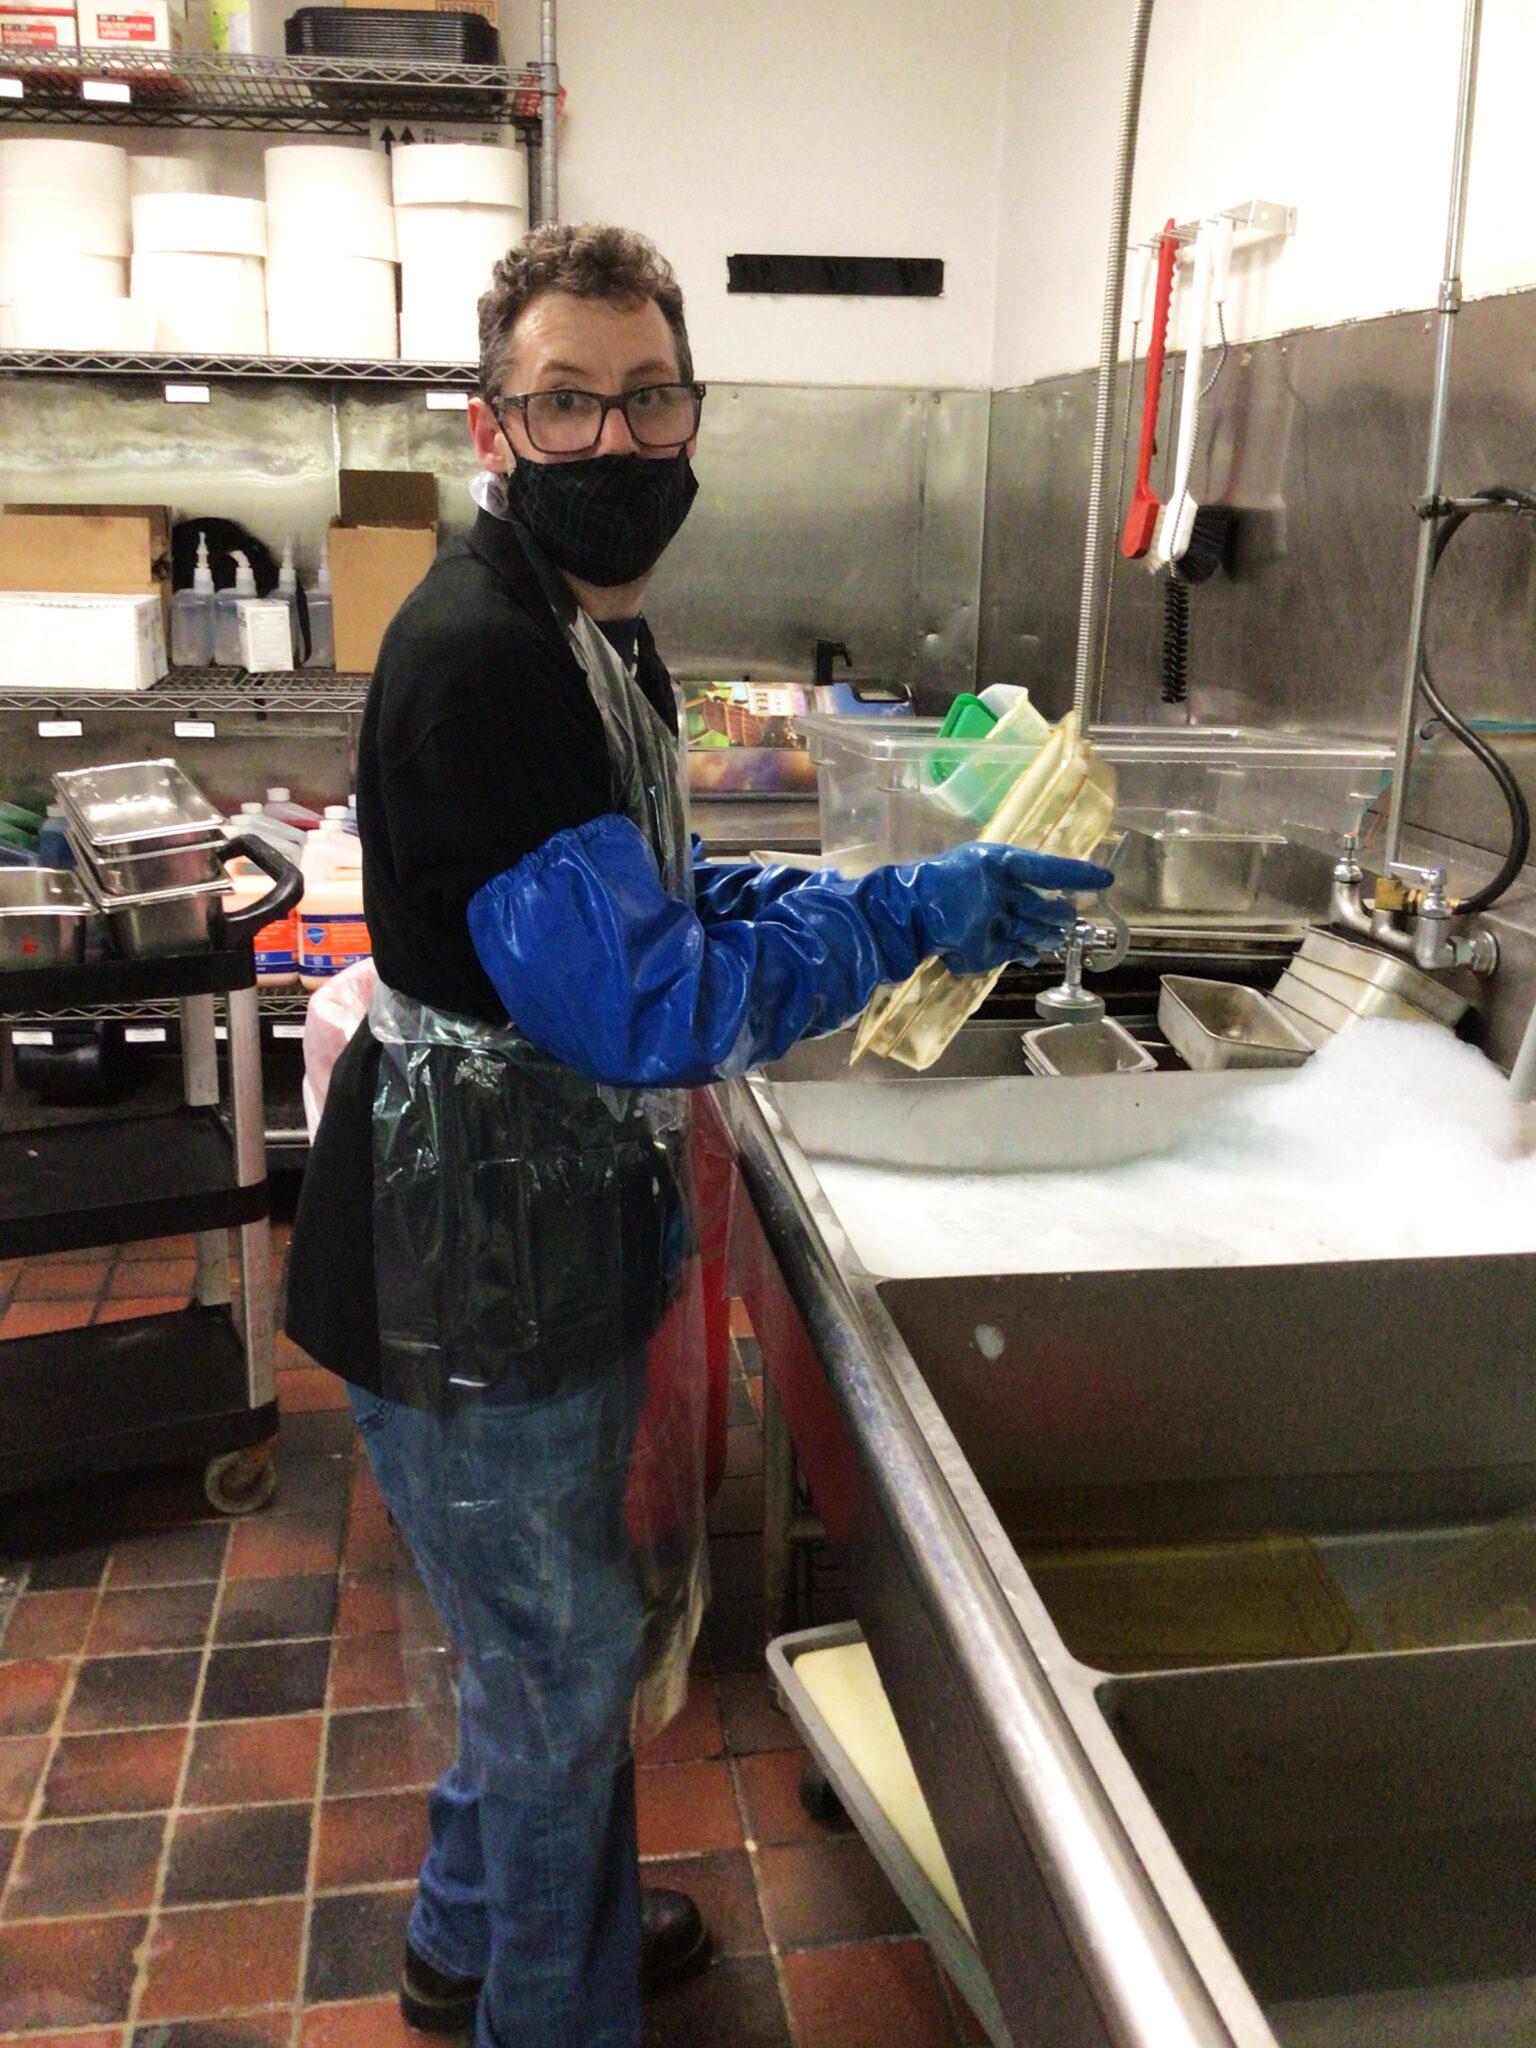 Joe P. working at Boston Market